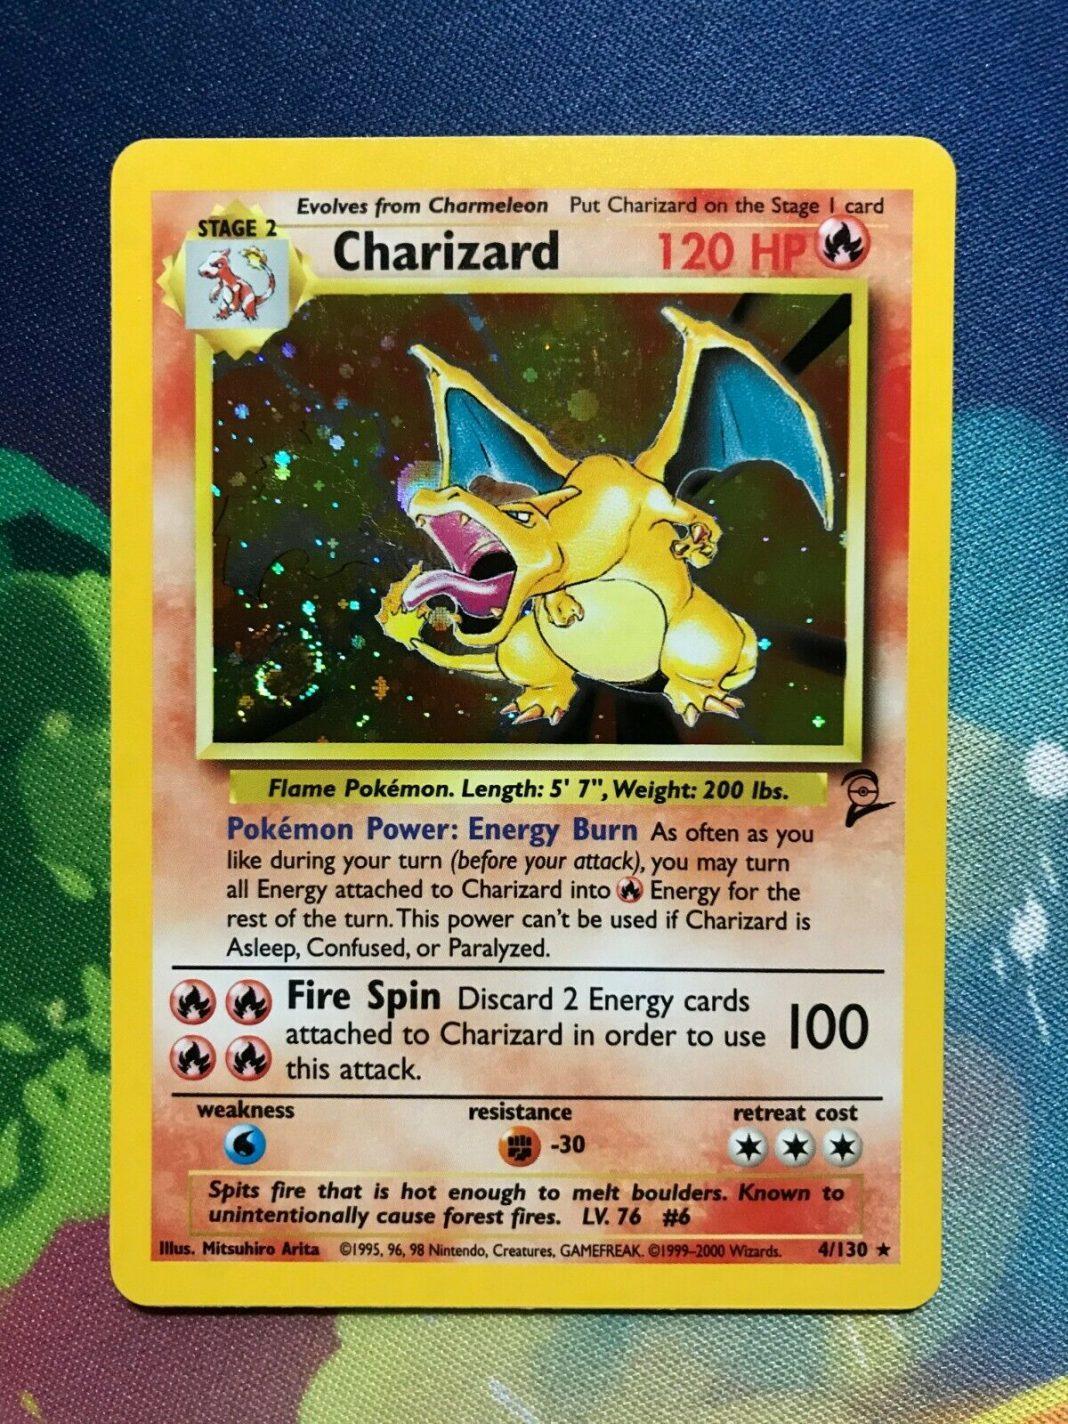 5 623 old charizard card worth homepedia